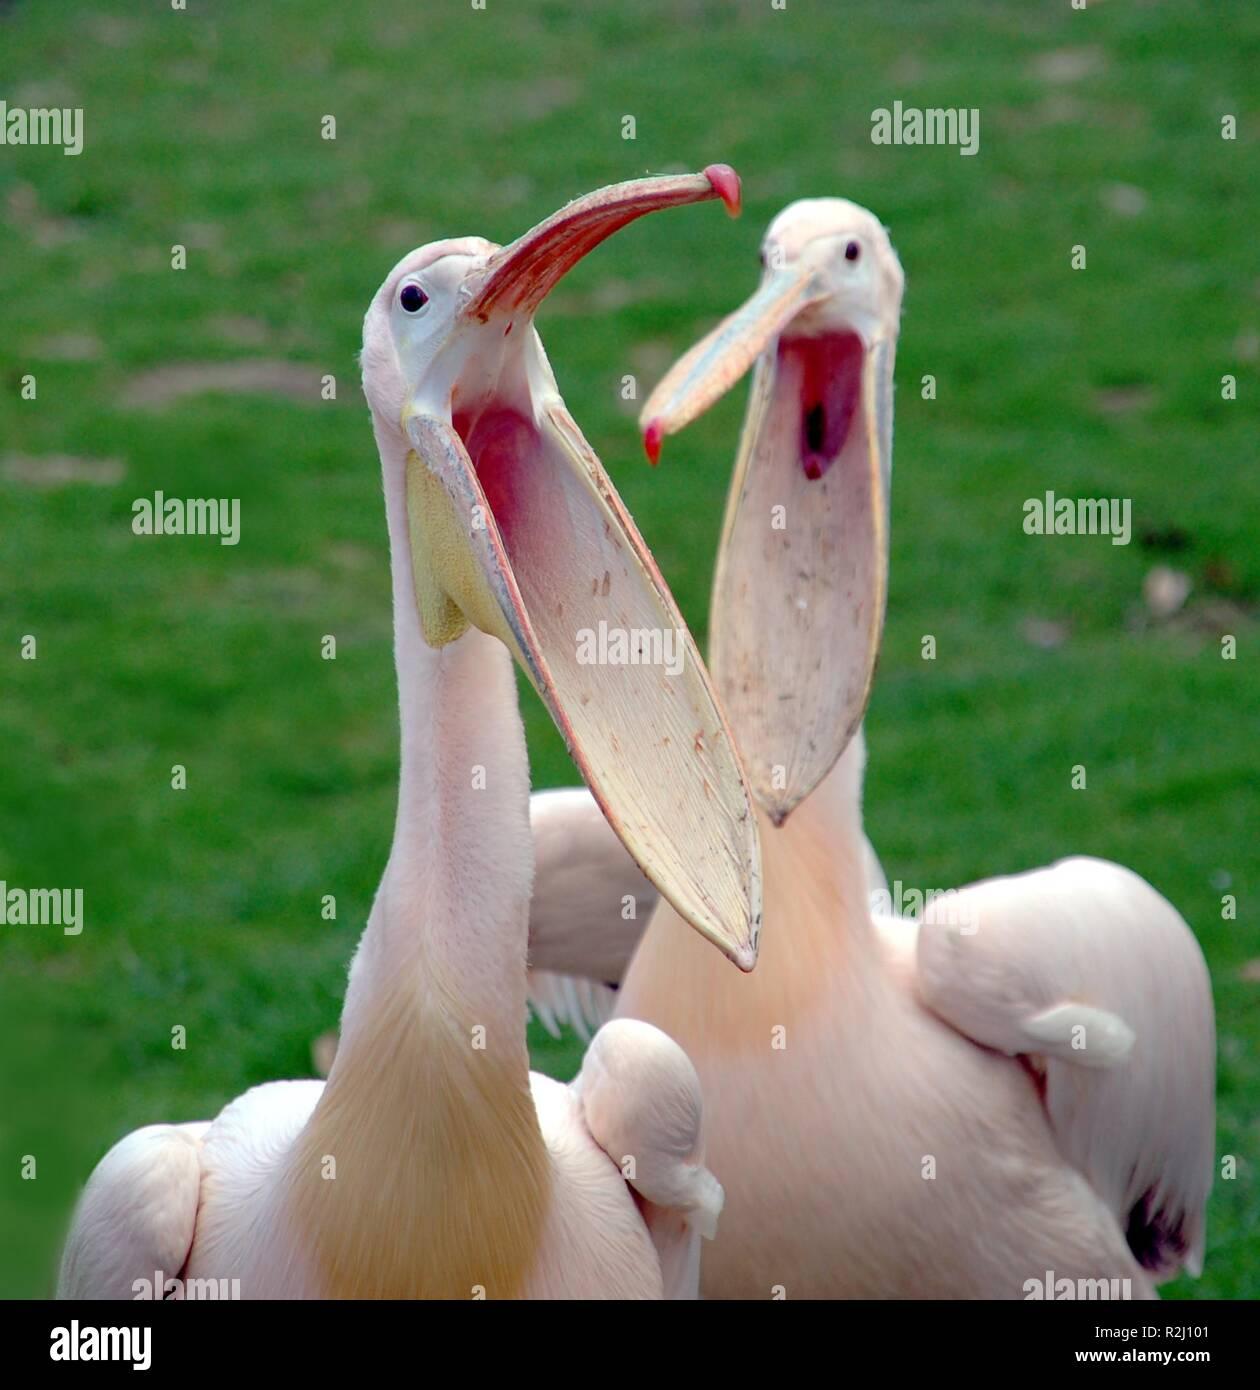 duet - Stock Image